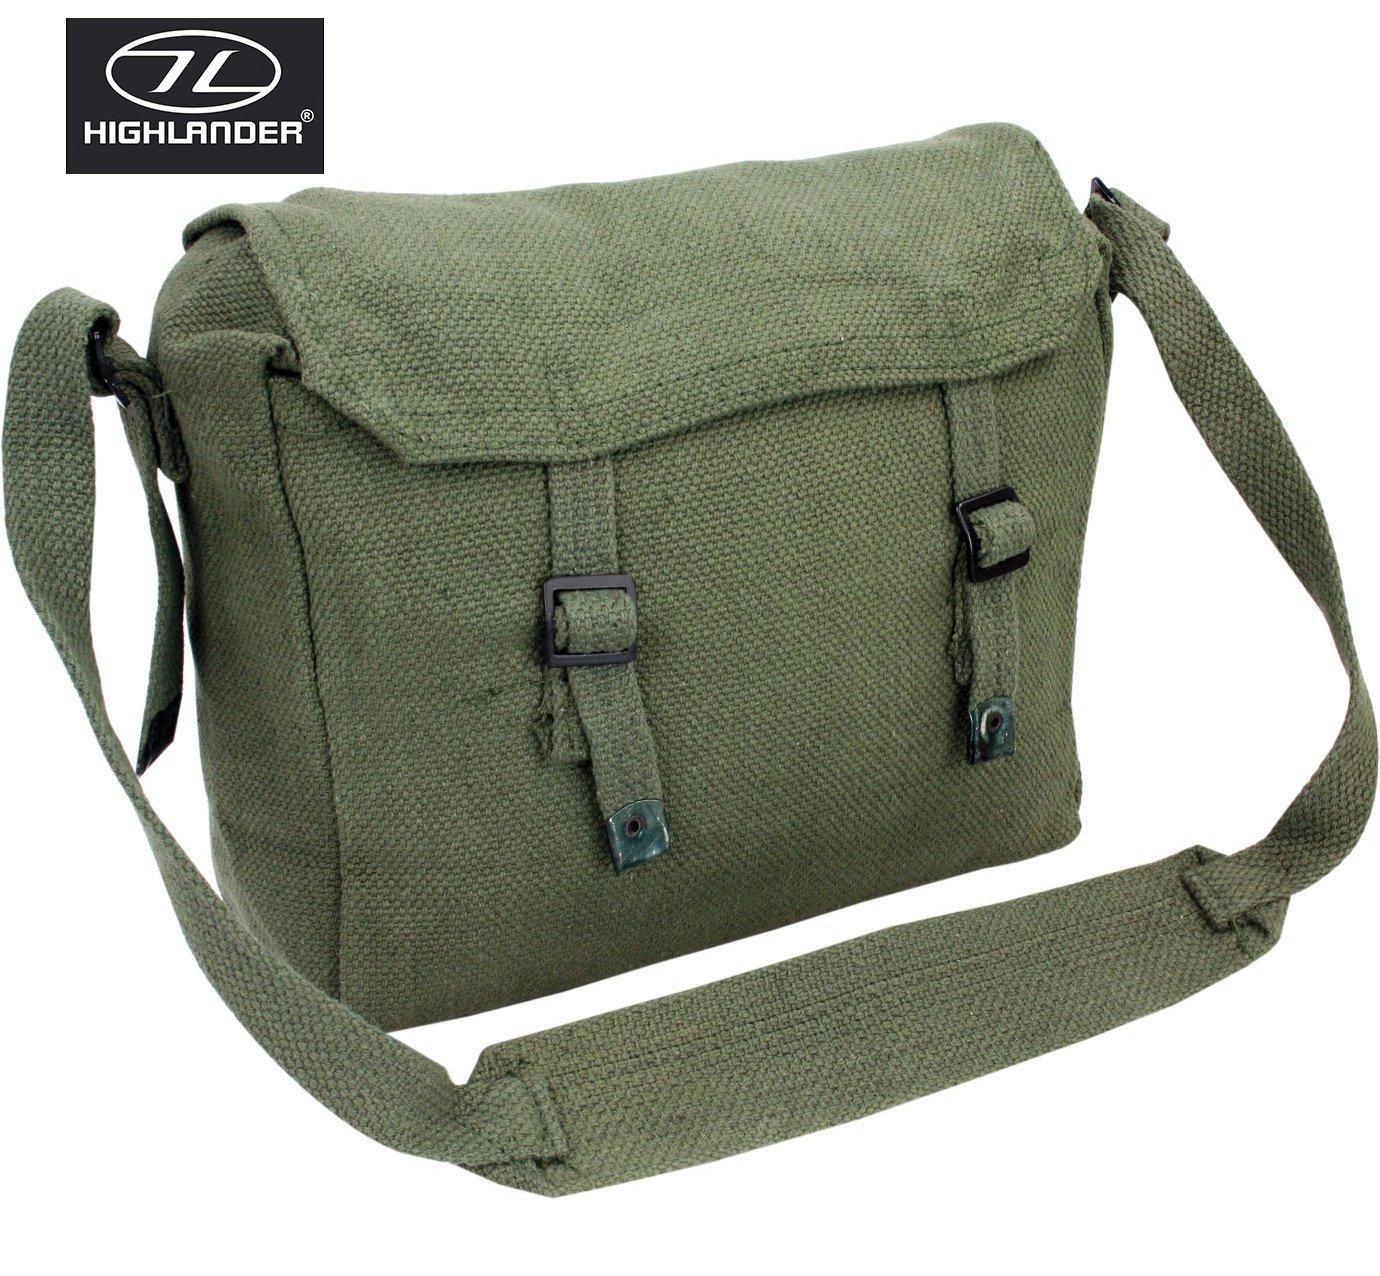 361fbe1ea5 Highlander Army Travel Shoulder Military Combat Day Bag Messenger Satchel  Canvas Surplus Haversack Green  Amazon.co.uk  Sports   Outdoors